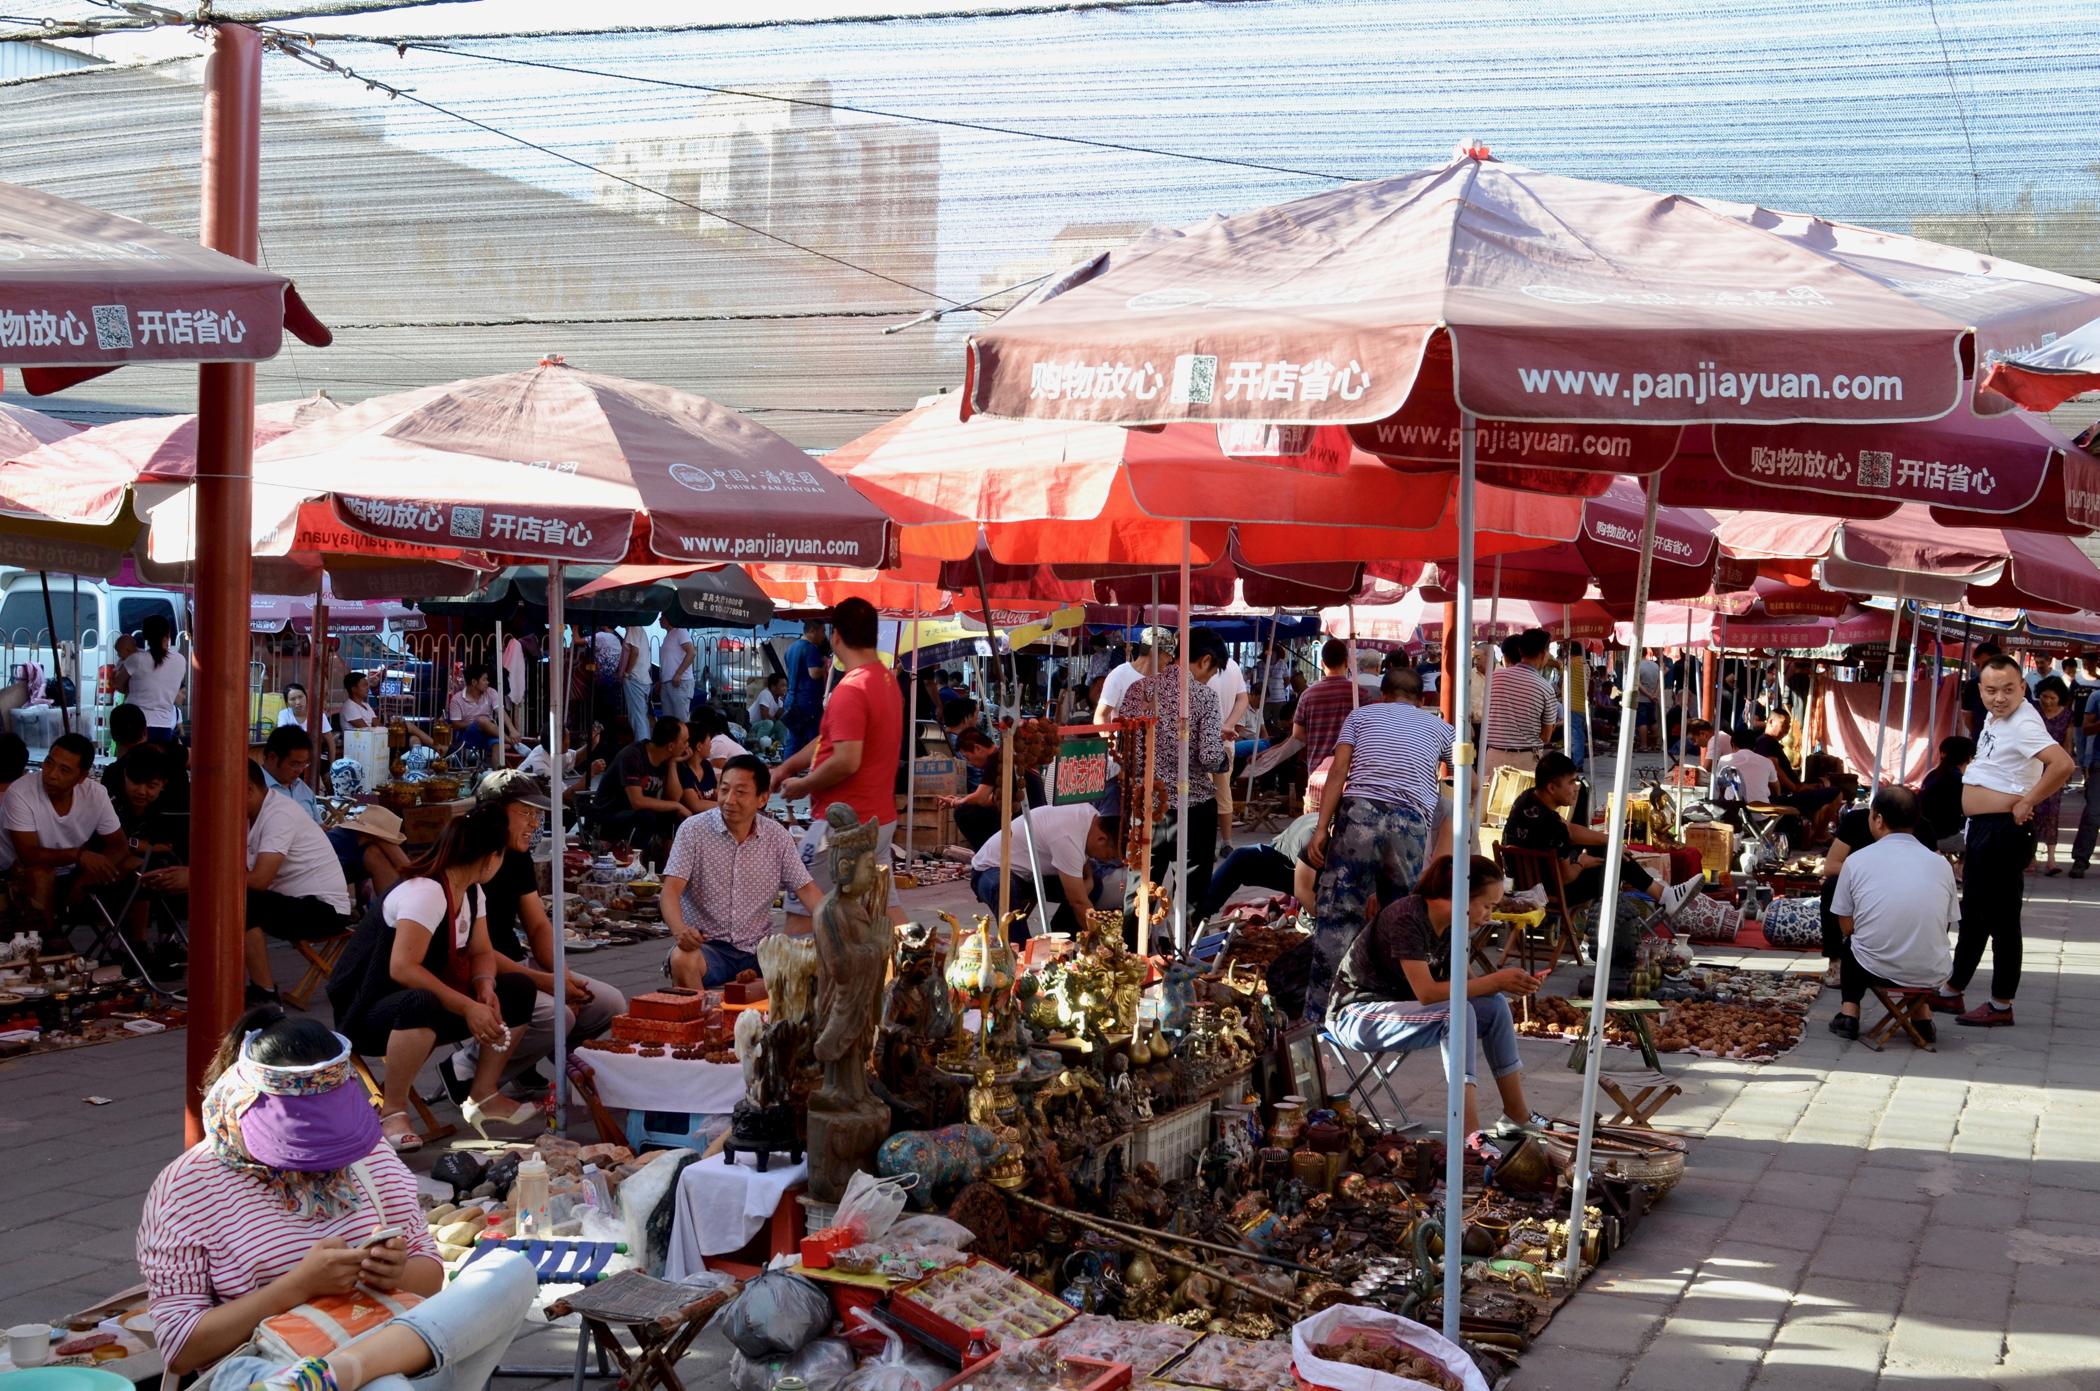 Modern-Beijing-Sehenswuerdigkeiten-Panjiayuan-Flohmarkt